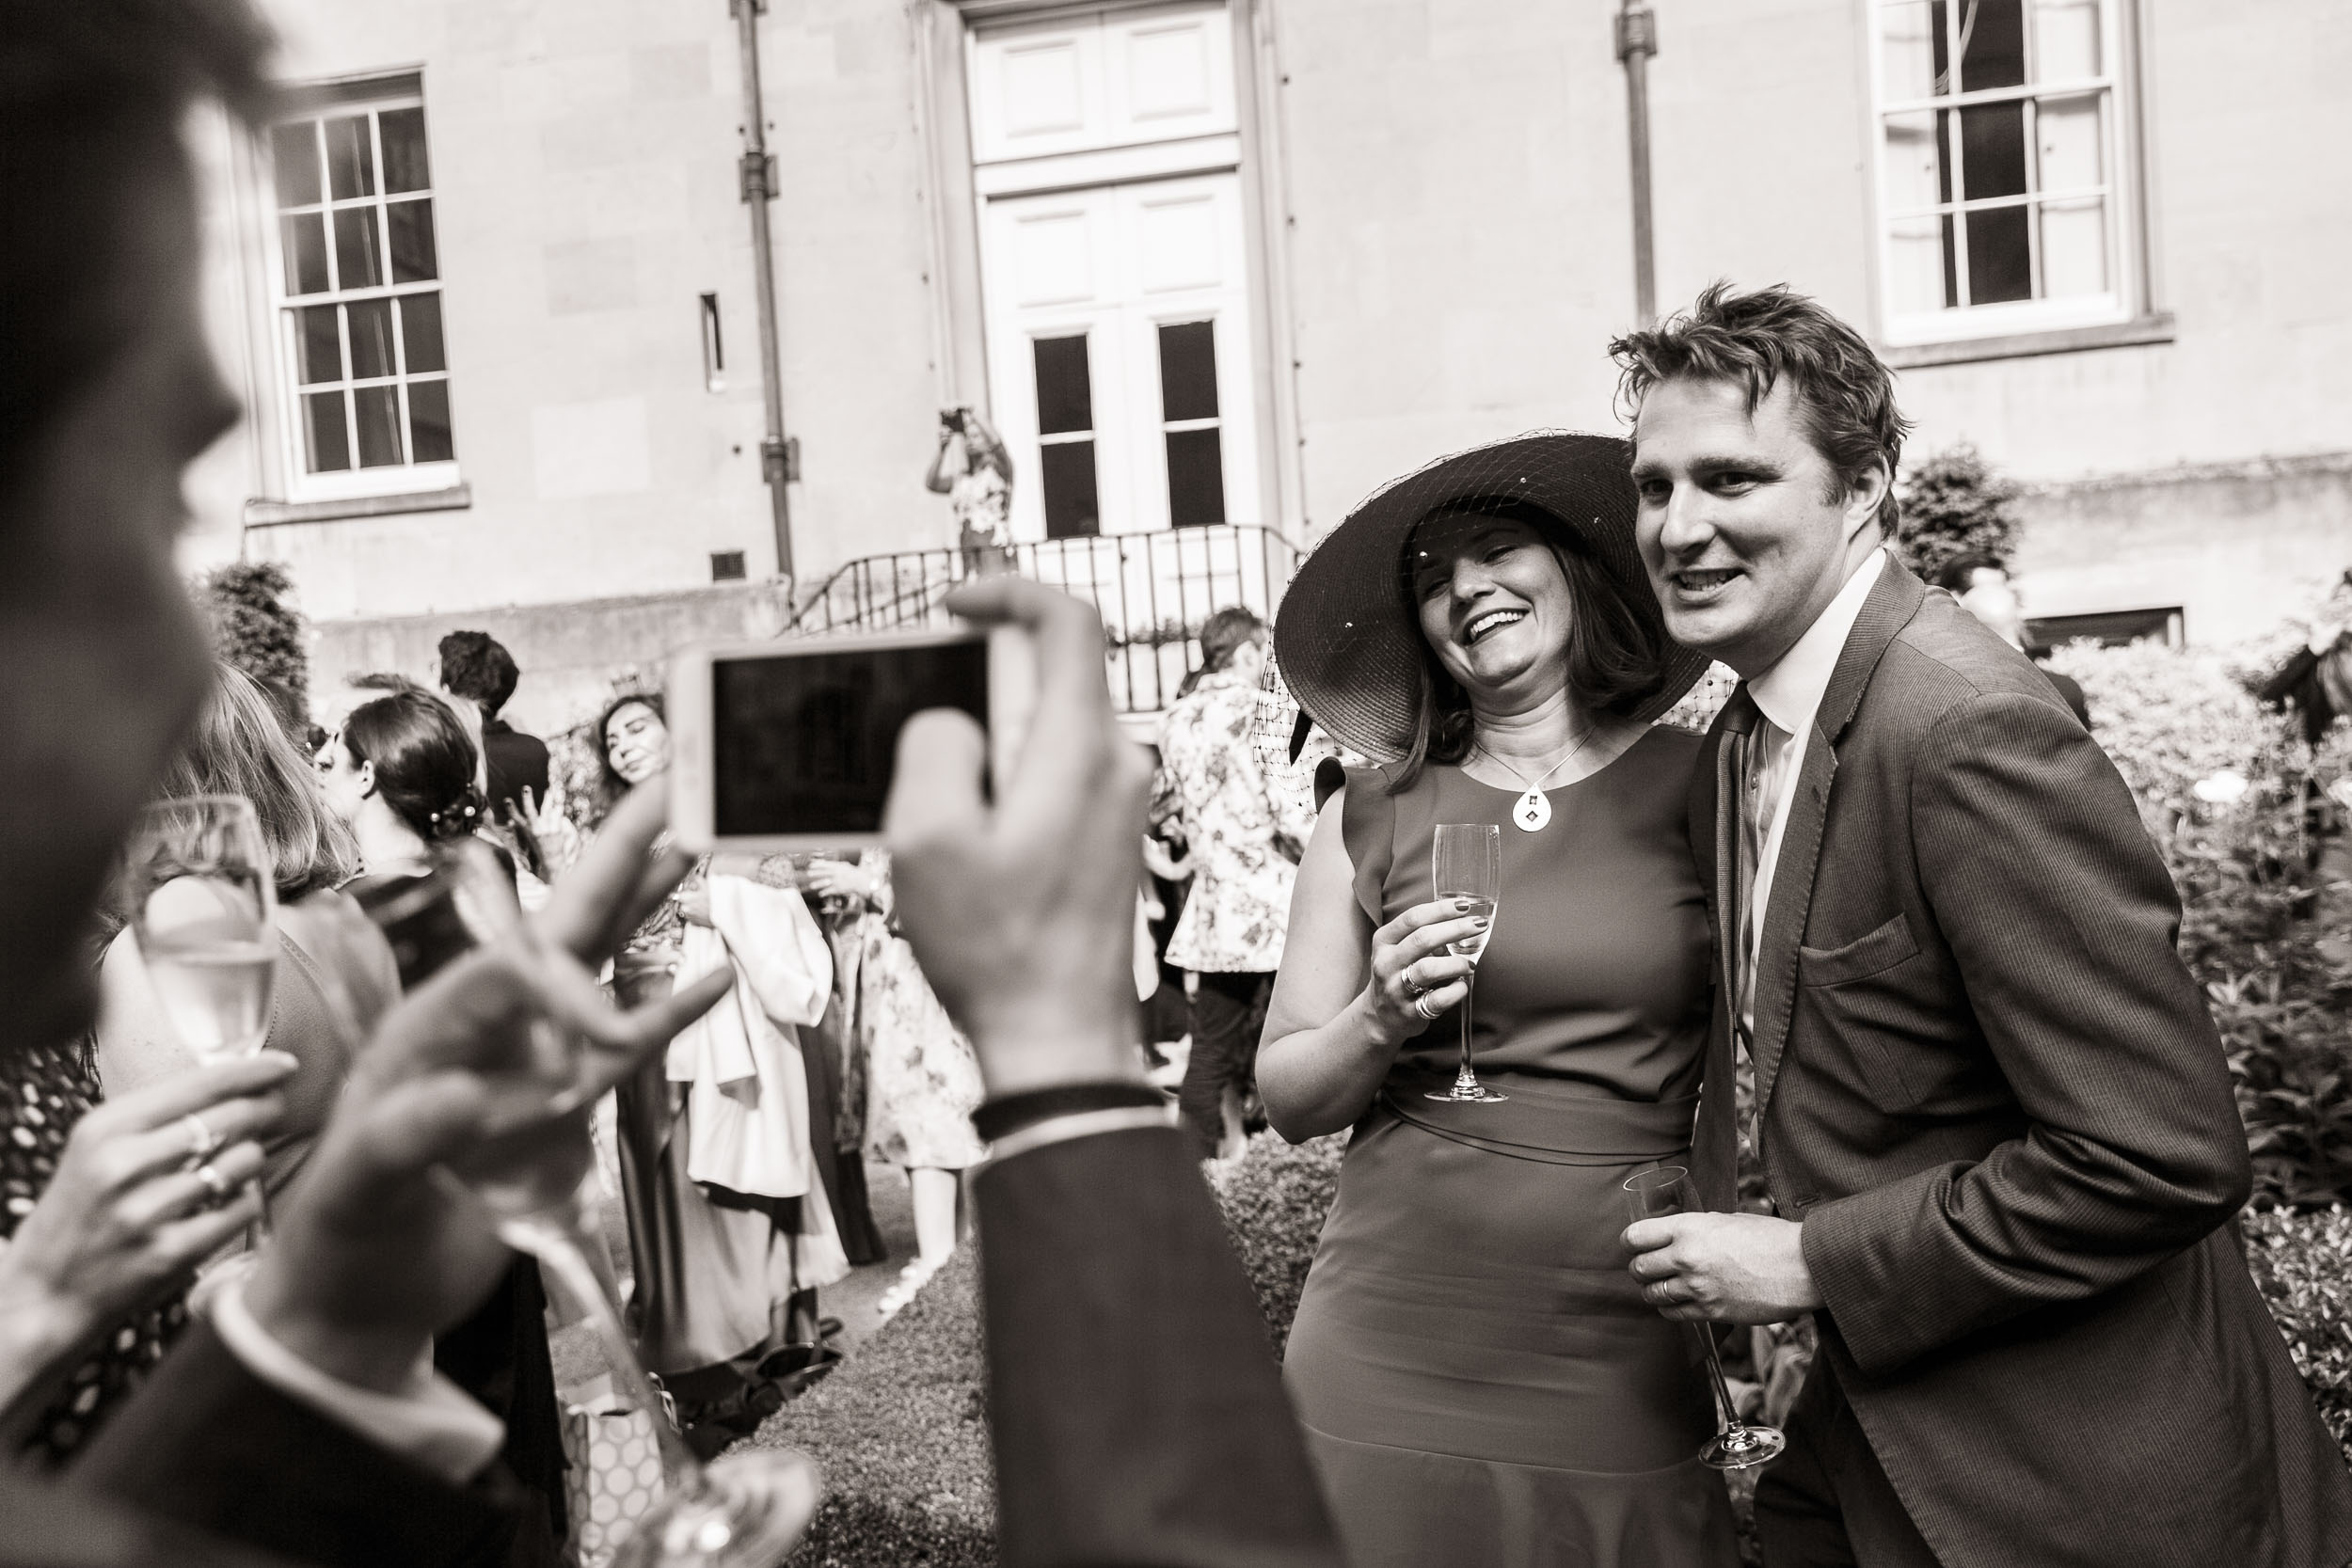 syon-house-wedding-photographer-london 095.jpg